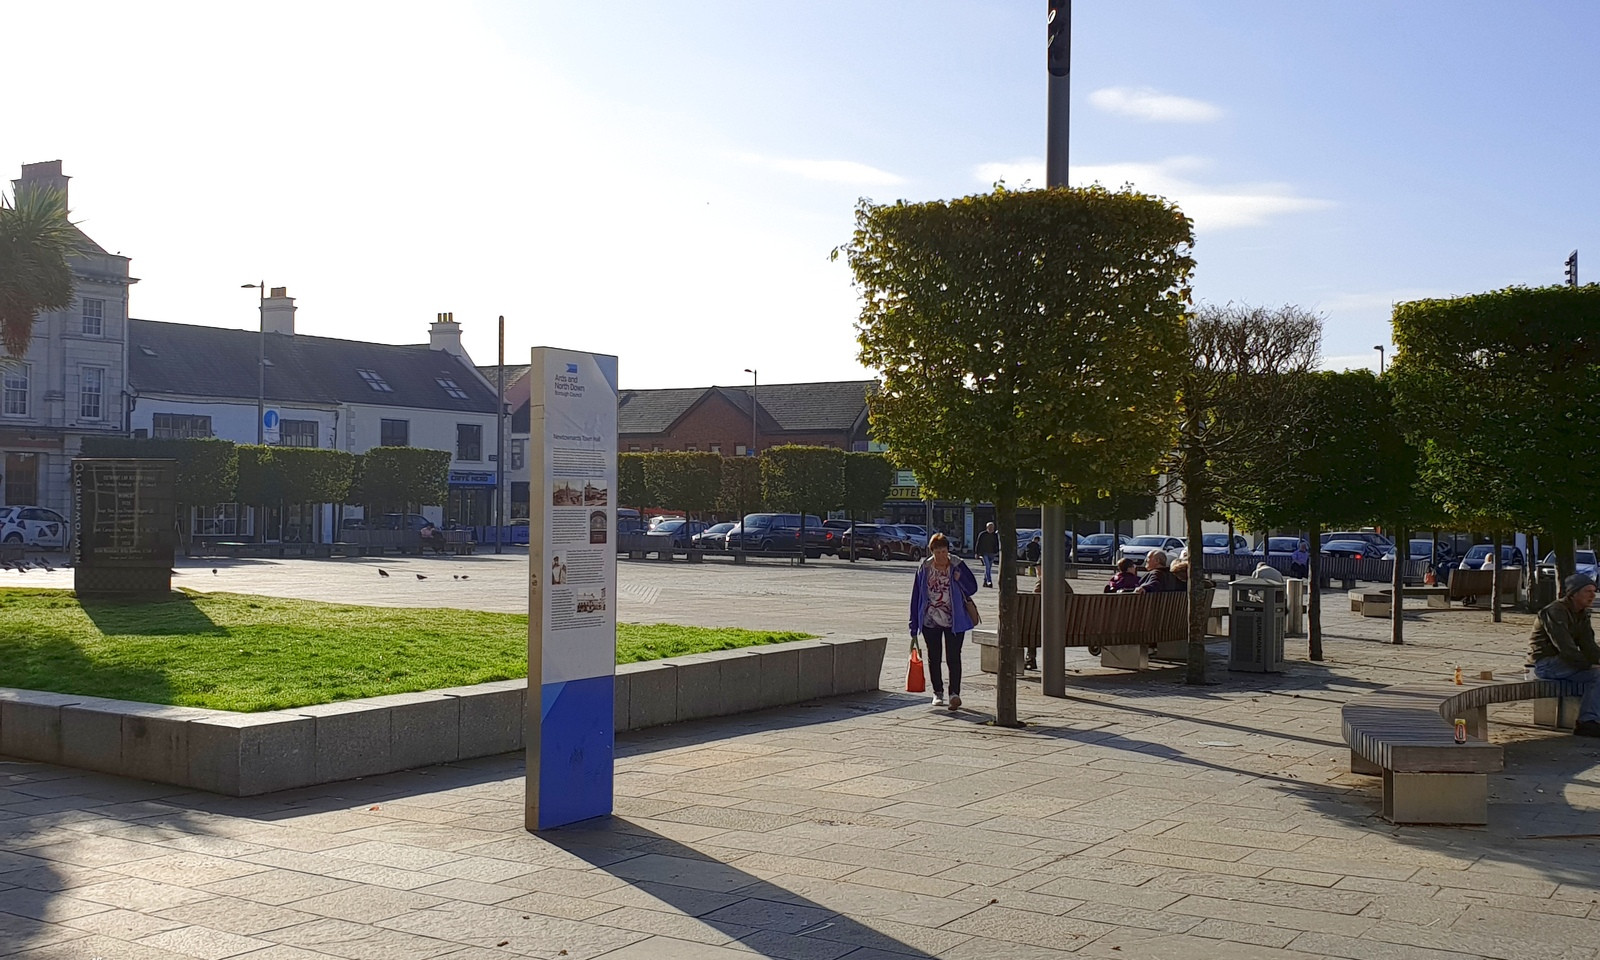 Newtownards Square